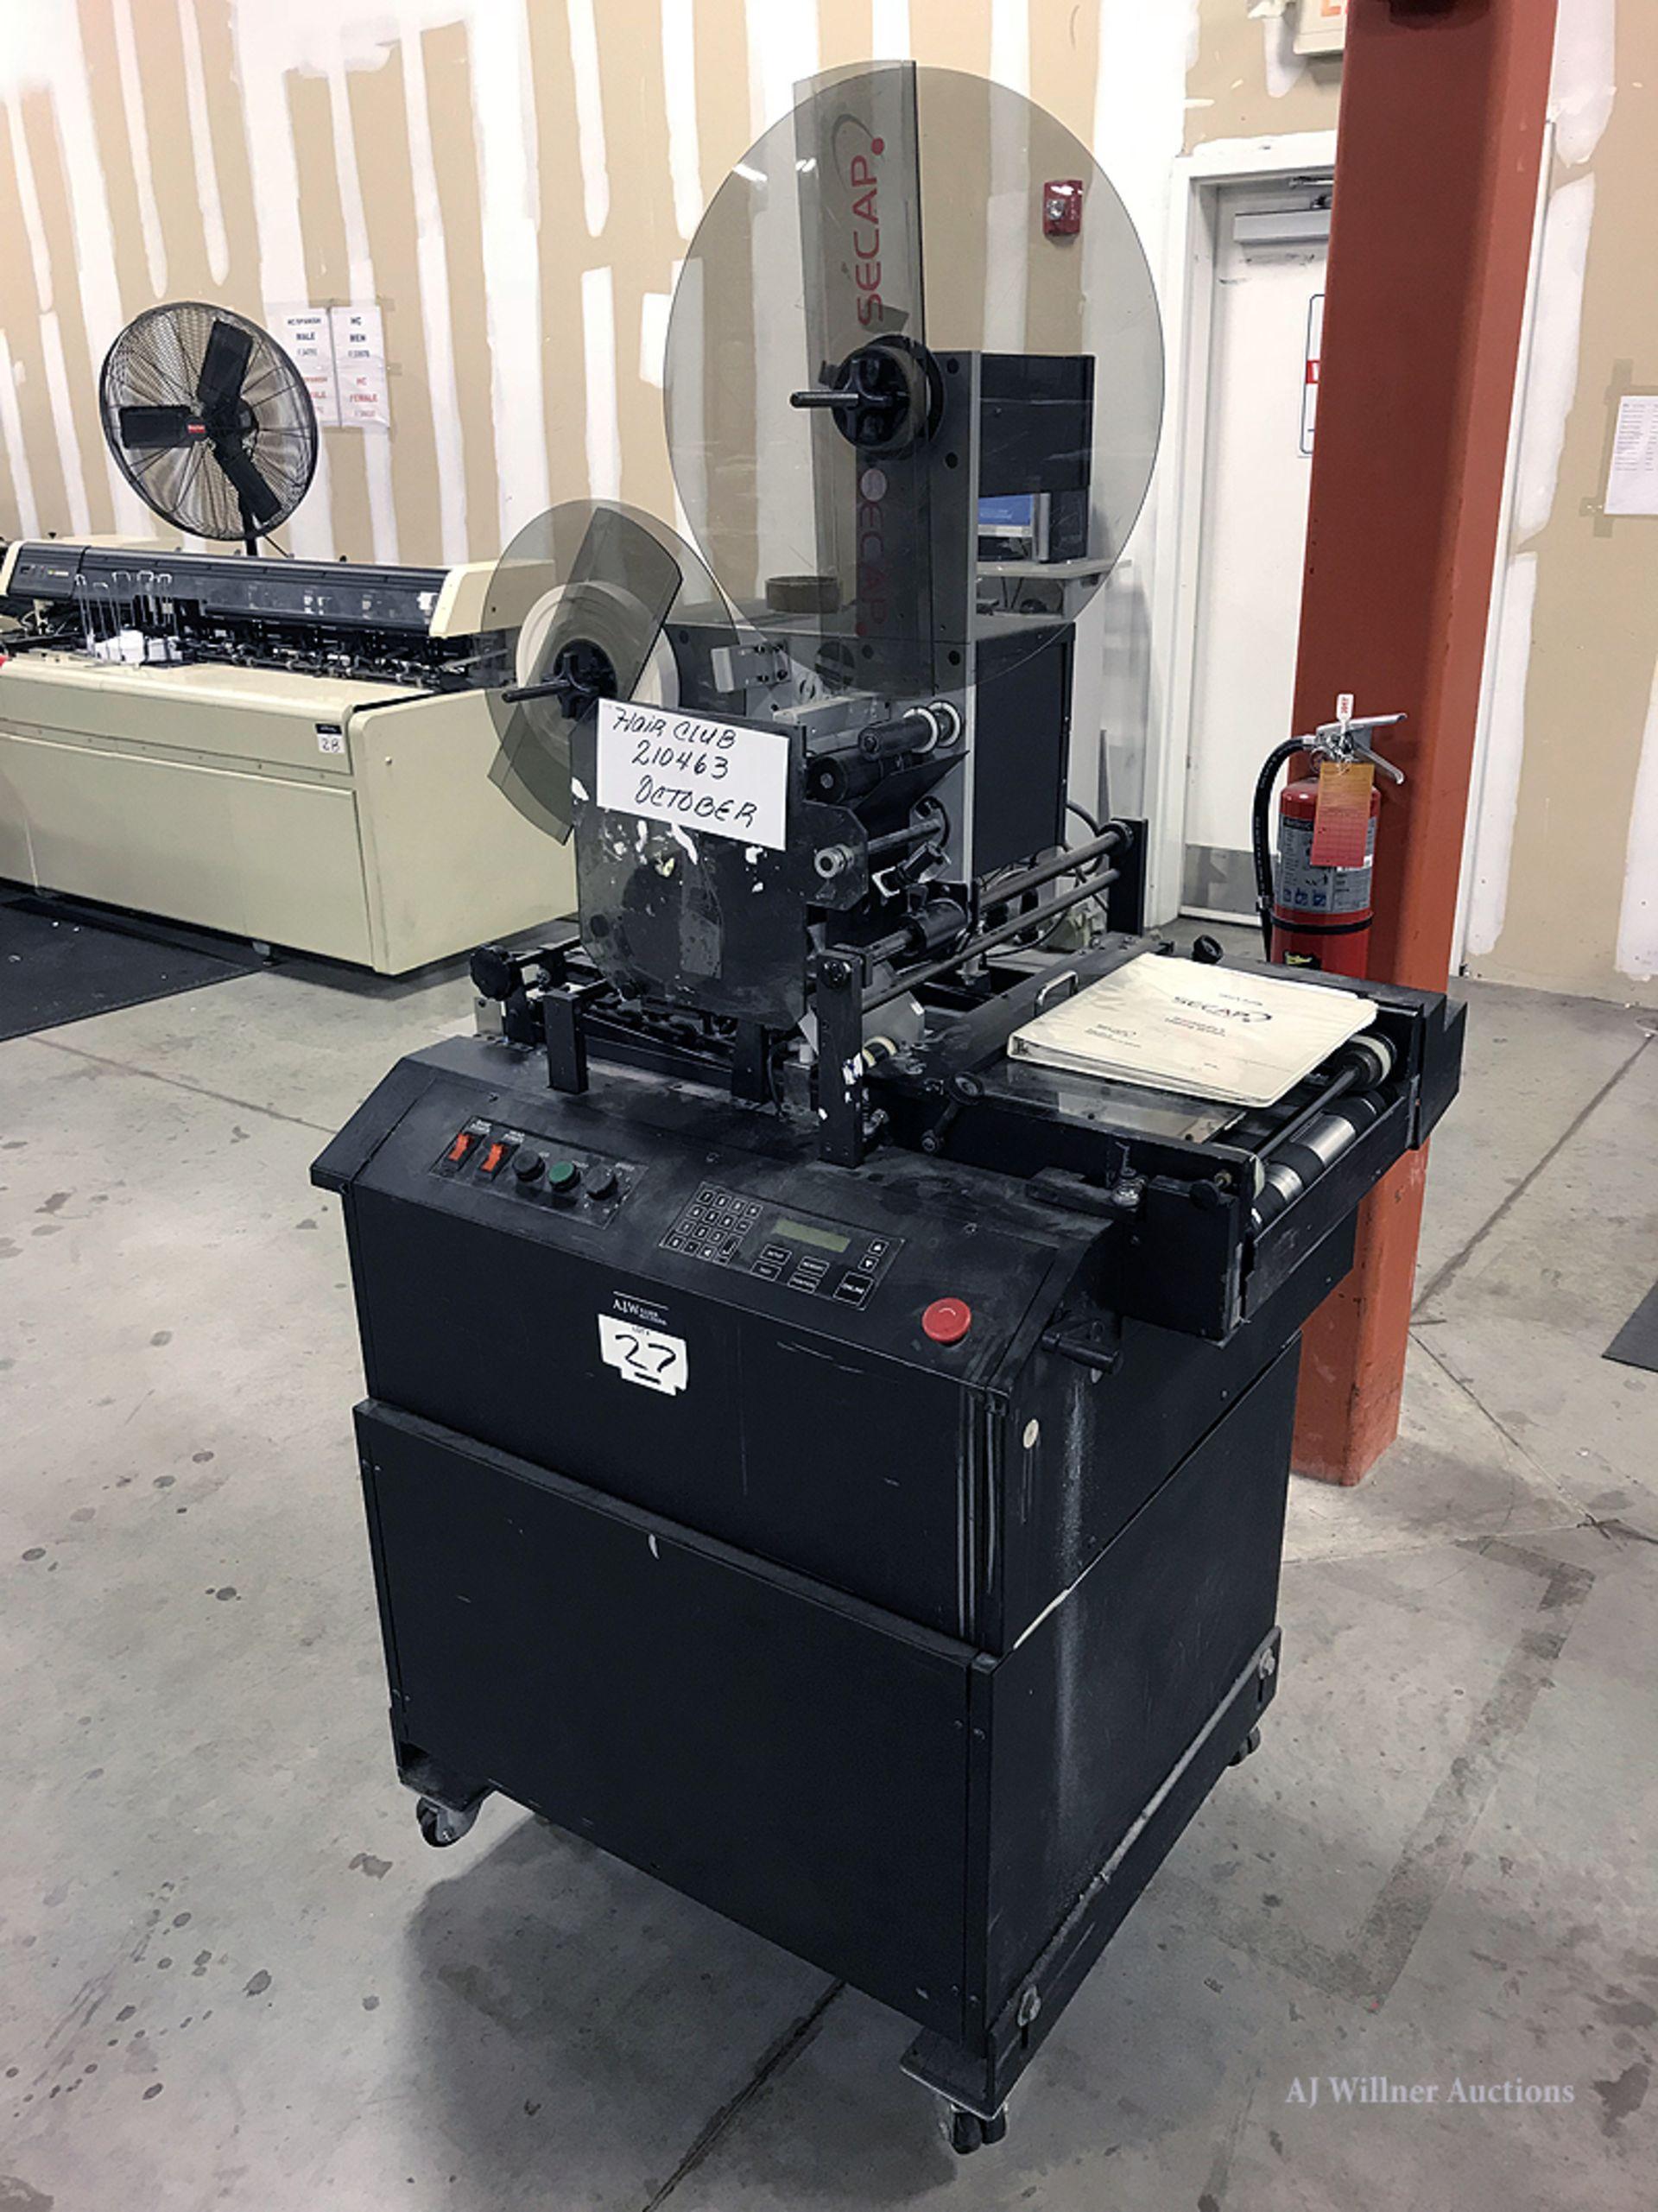 Lot 27 - Secap Model STDWH PrintStream II Tabber